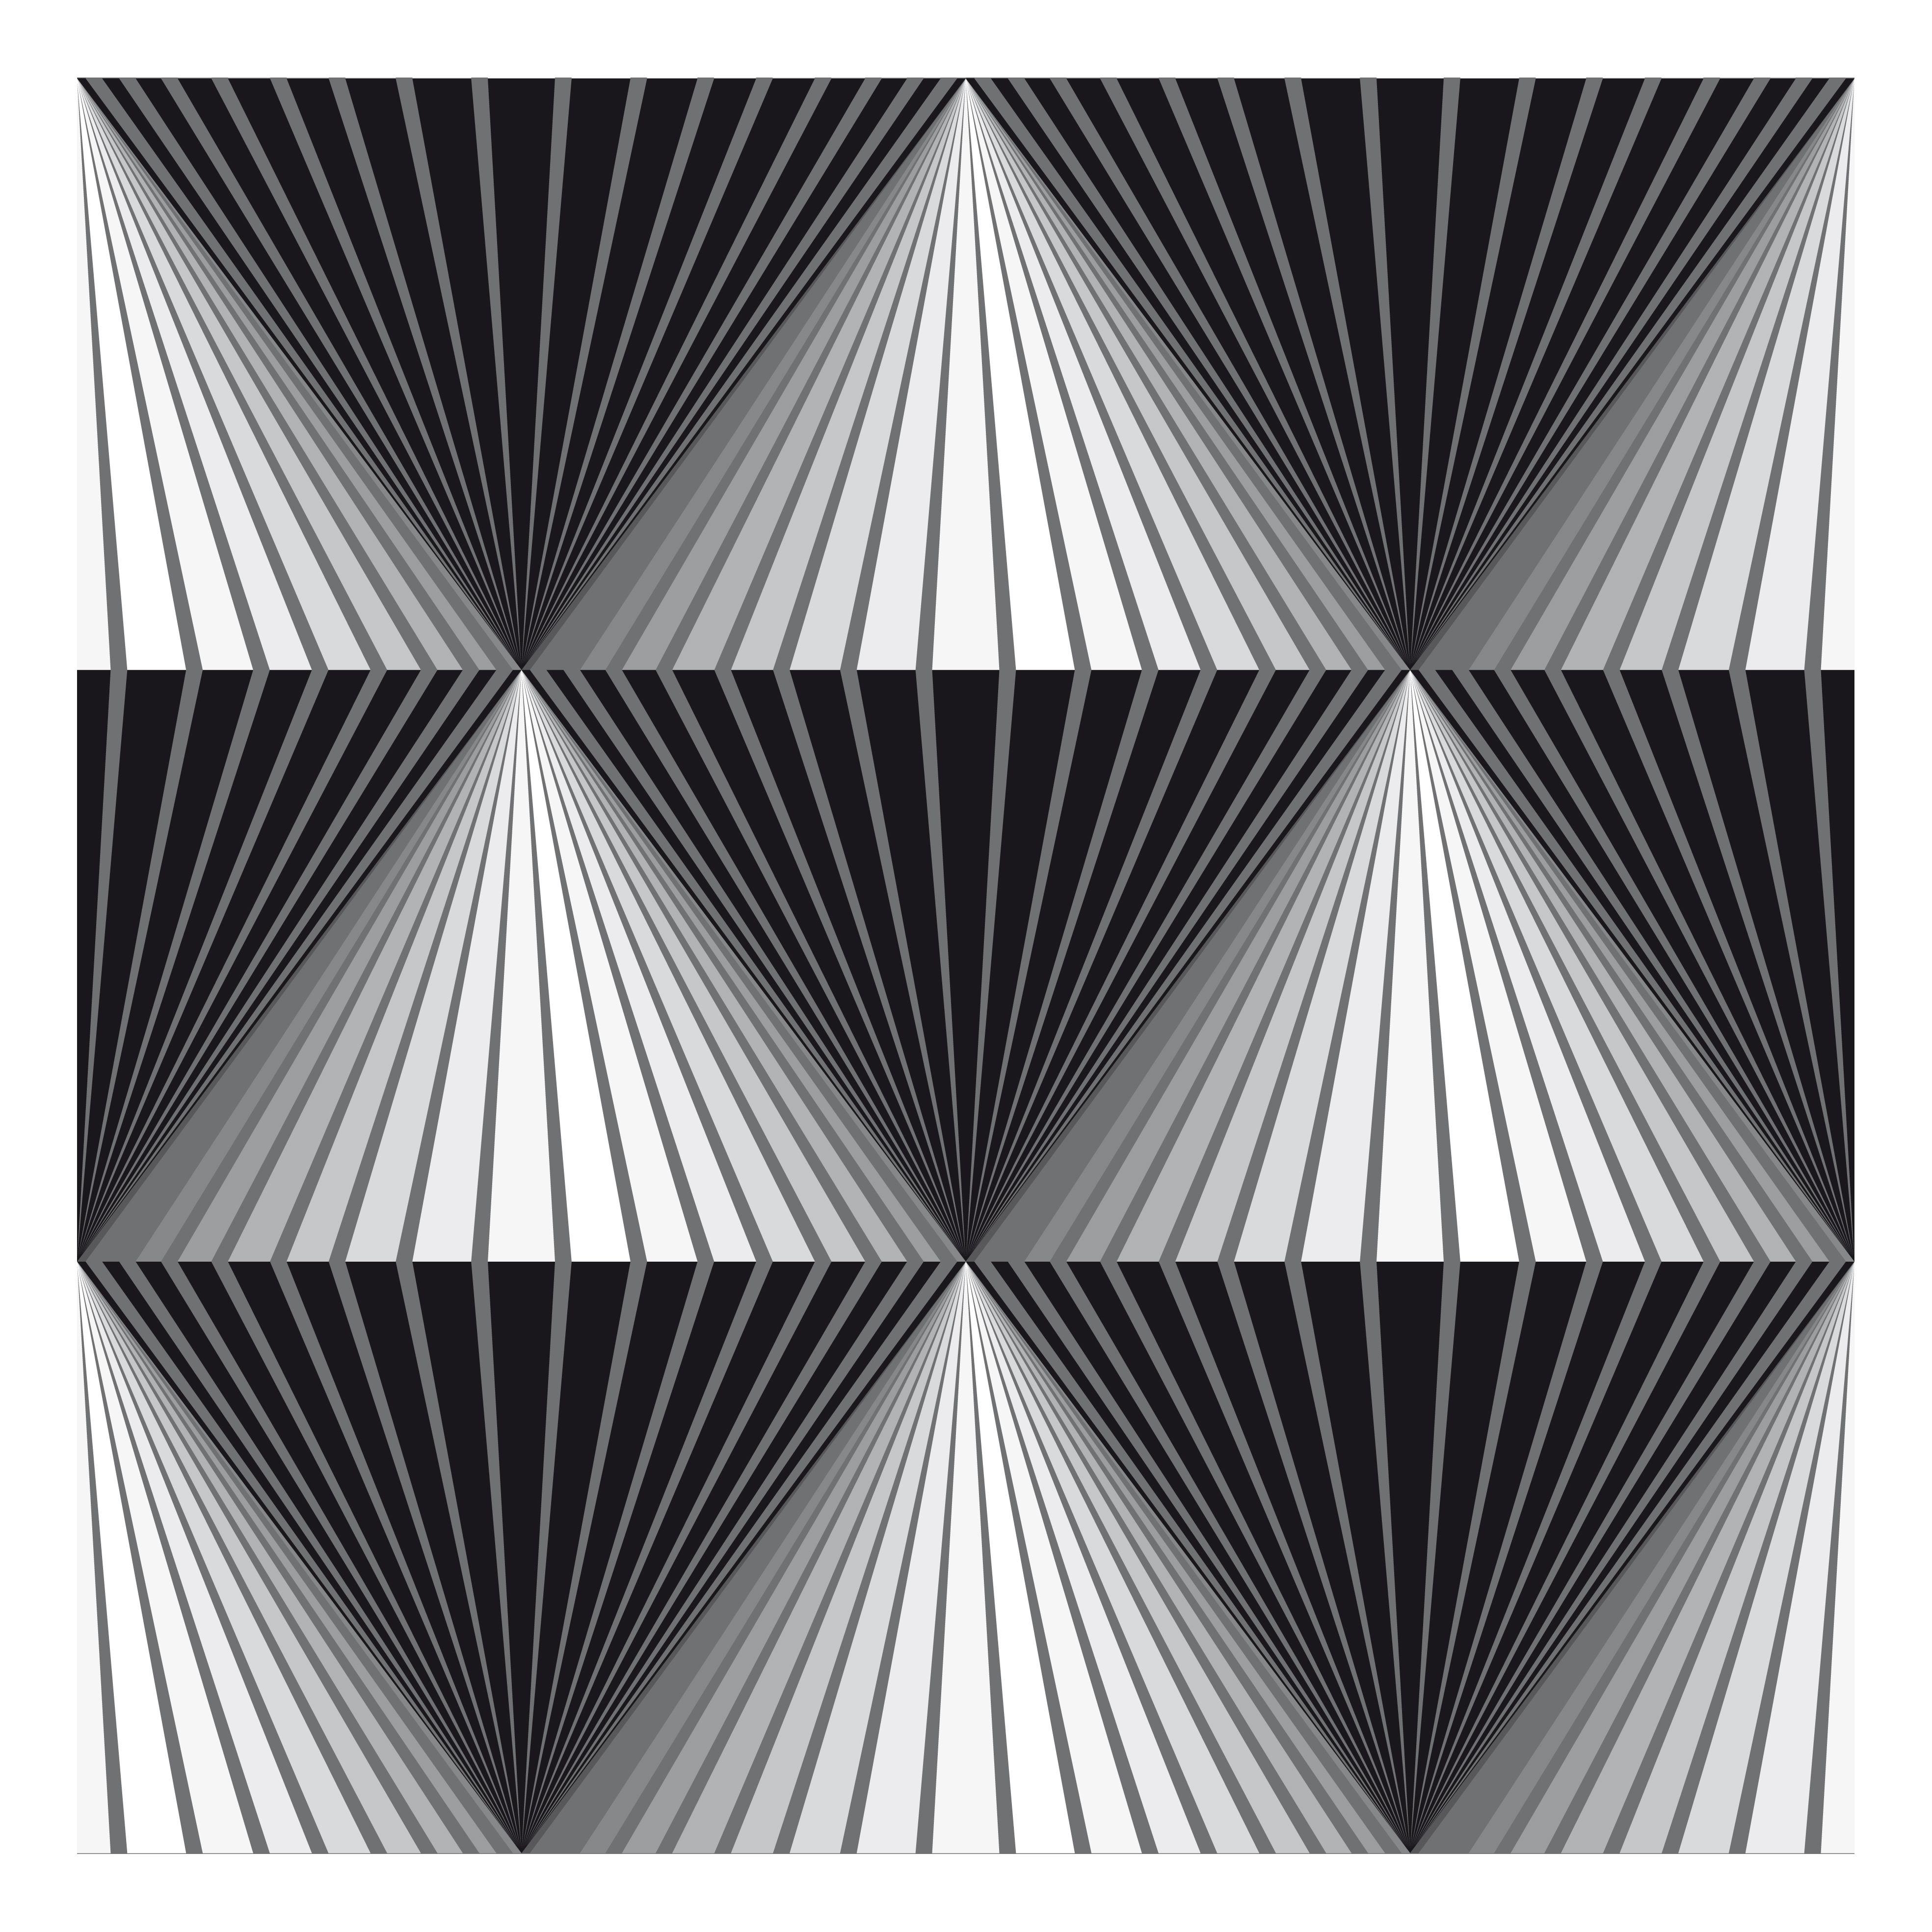 Black white and grey diamonds illustrations pinterest for Geometric illusion art